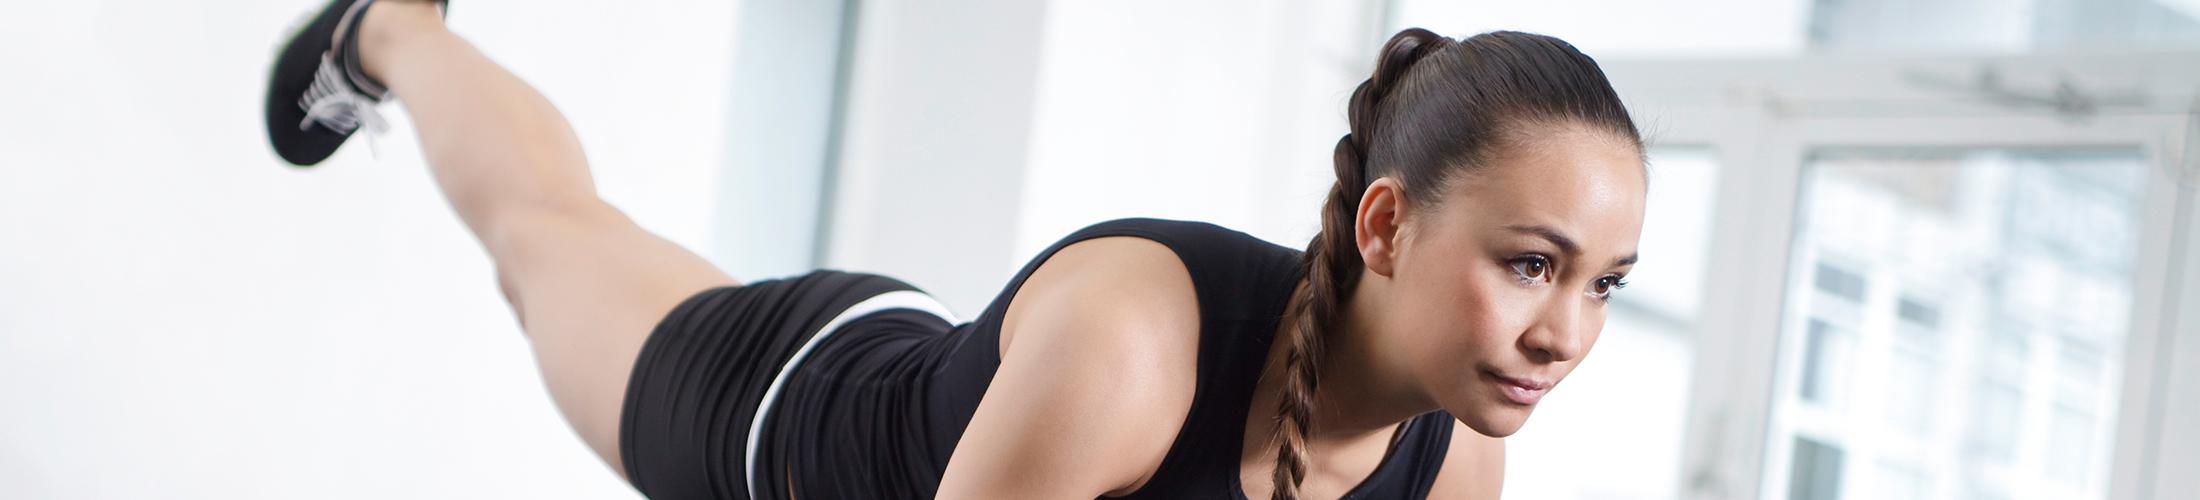 Trainingstherapie in der Physiotherapie-Praxis von Ramona Stephan